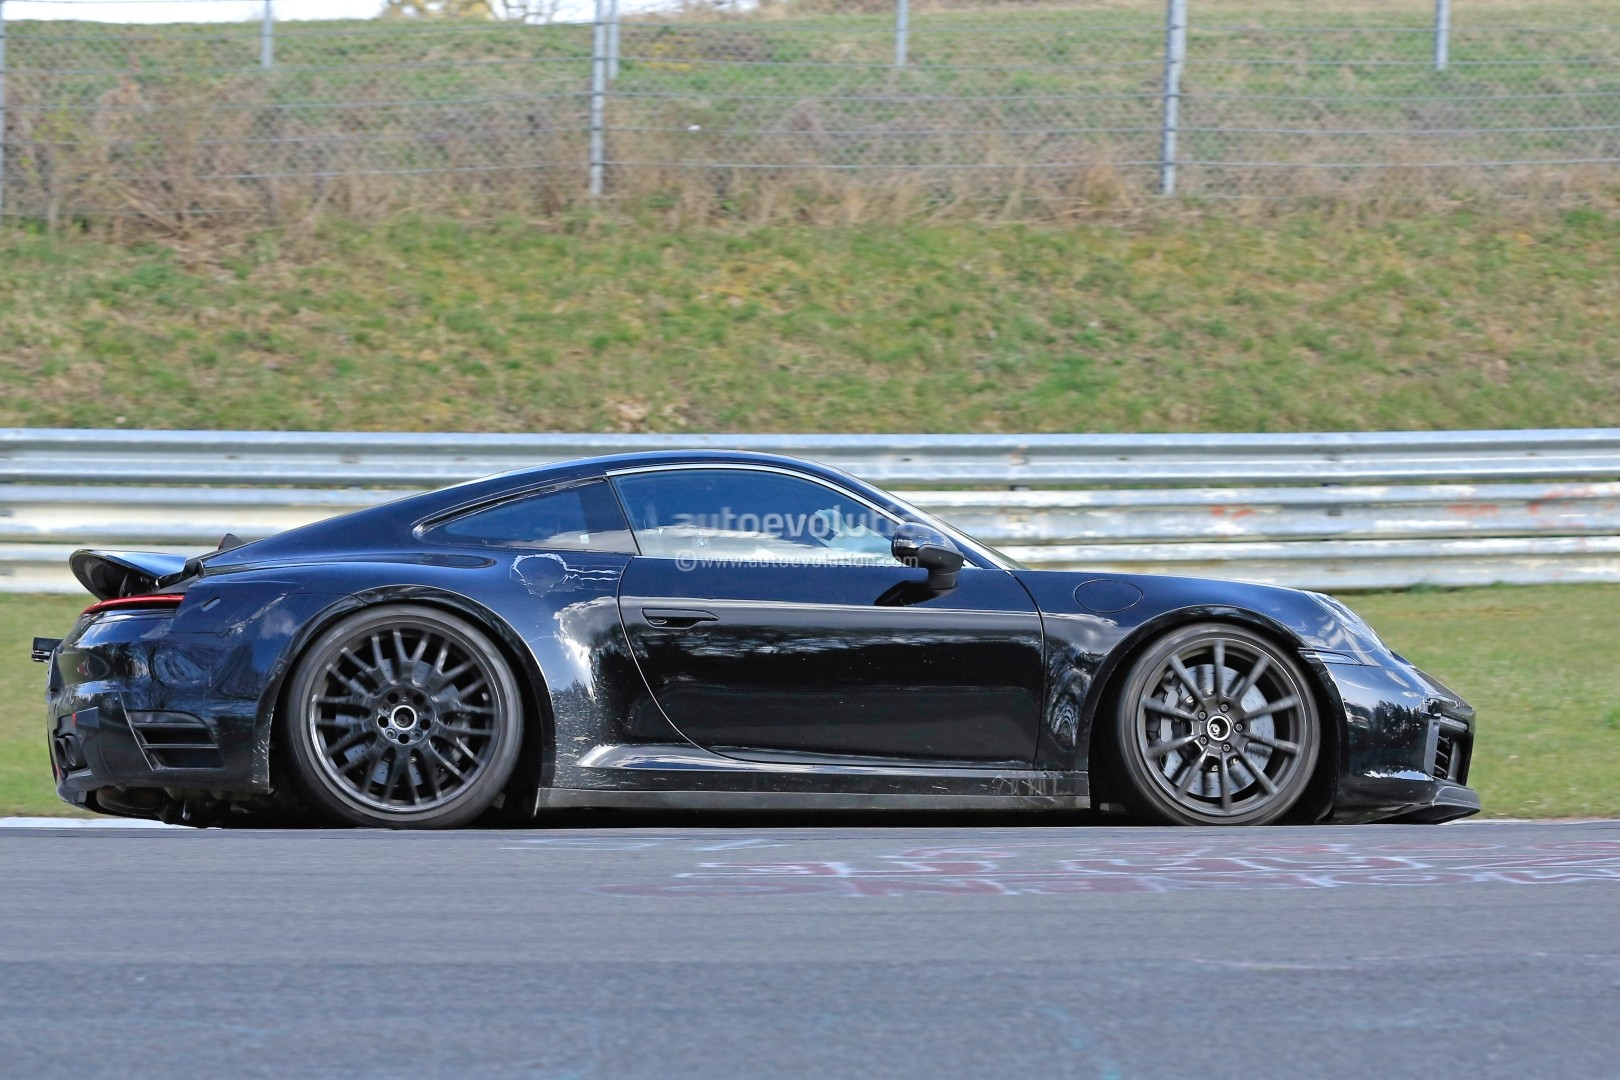 2018 - [Porsche] 911 - Page 3 New-2019-porsche-911-makes-nurburgring-debut-prototype-has-mysterios-fuel-door_6